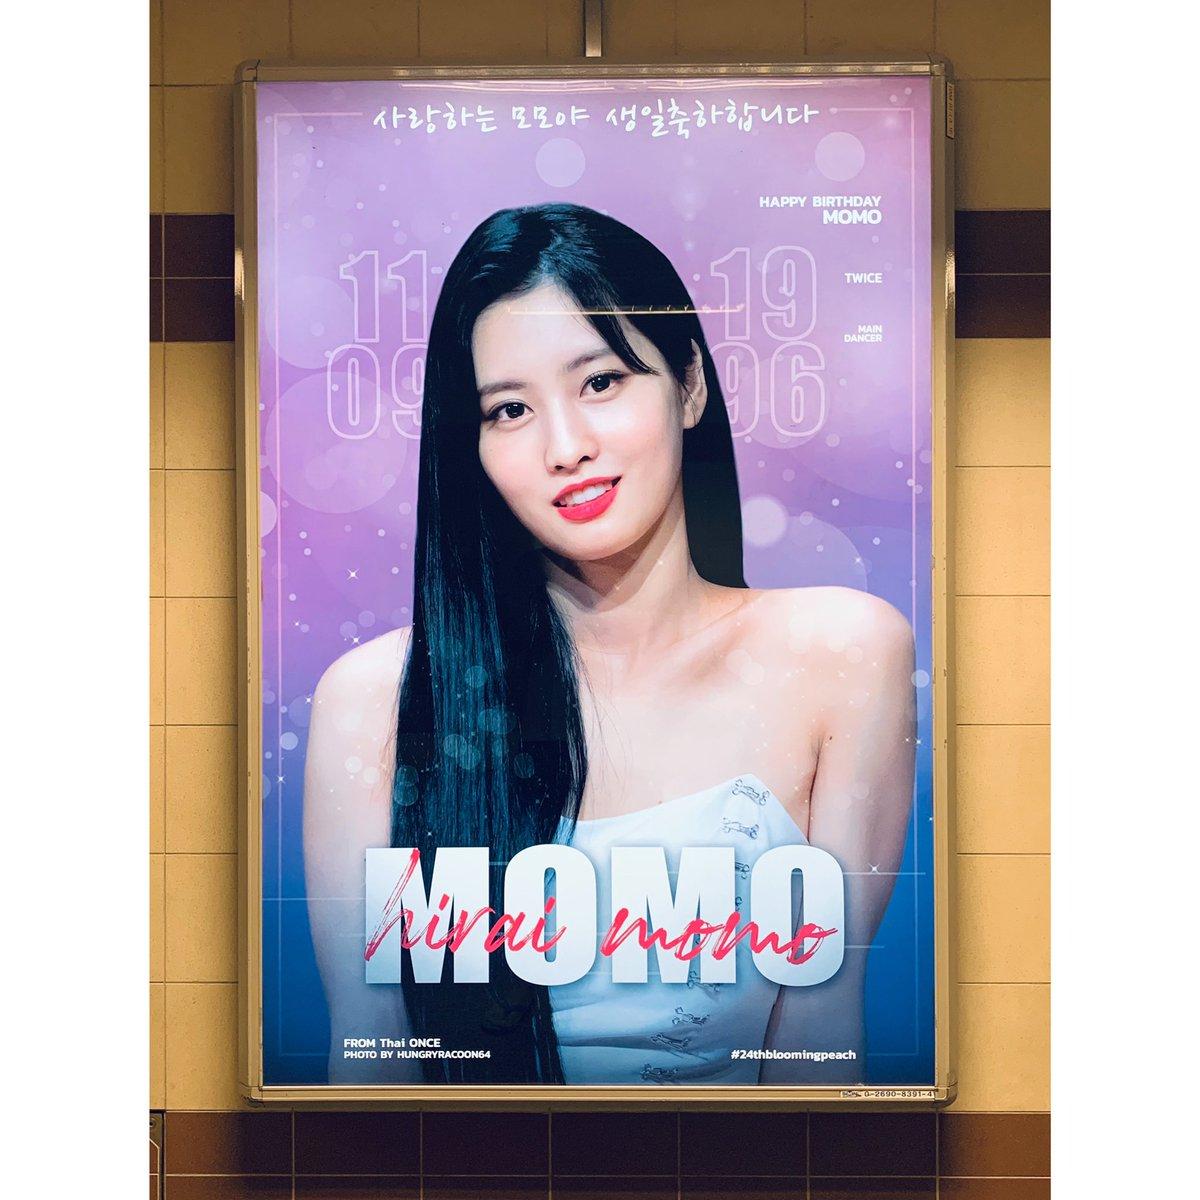 Momo Happyday 🎂 #HappyMOMOday #DancingMachineMomo #OurLovelyMomoDay